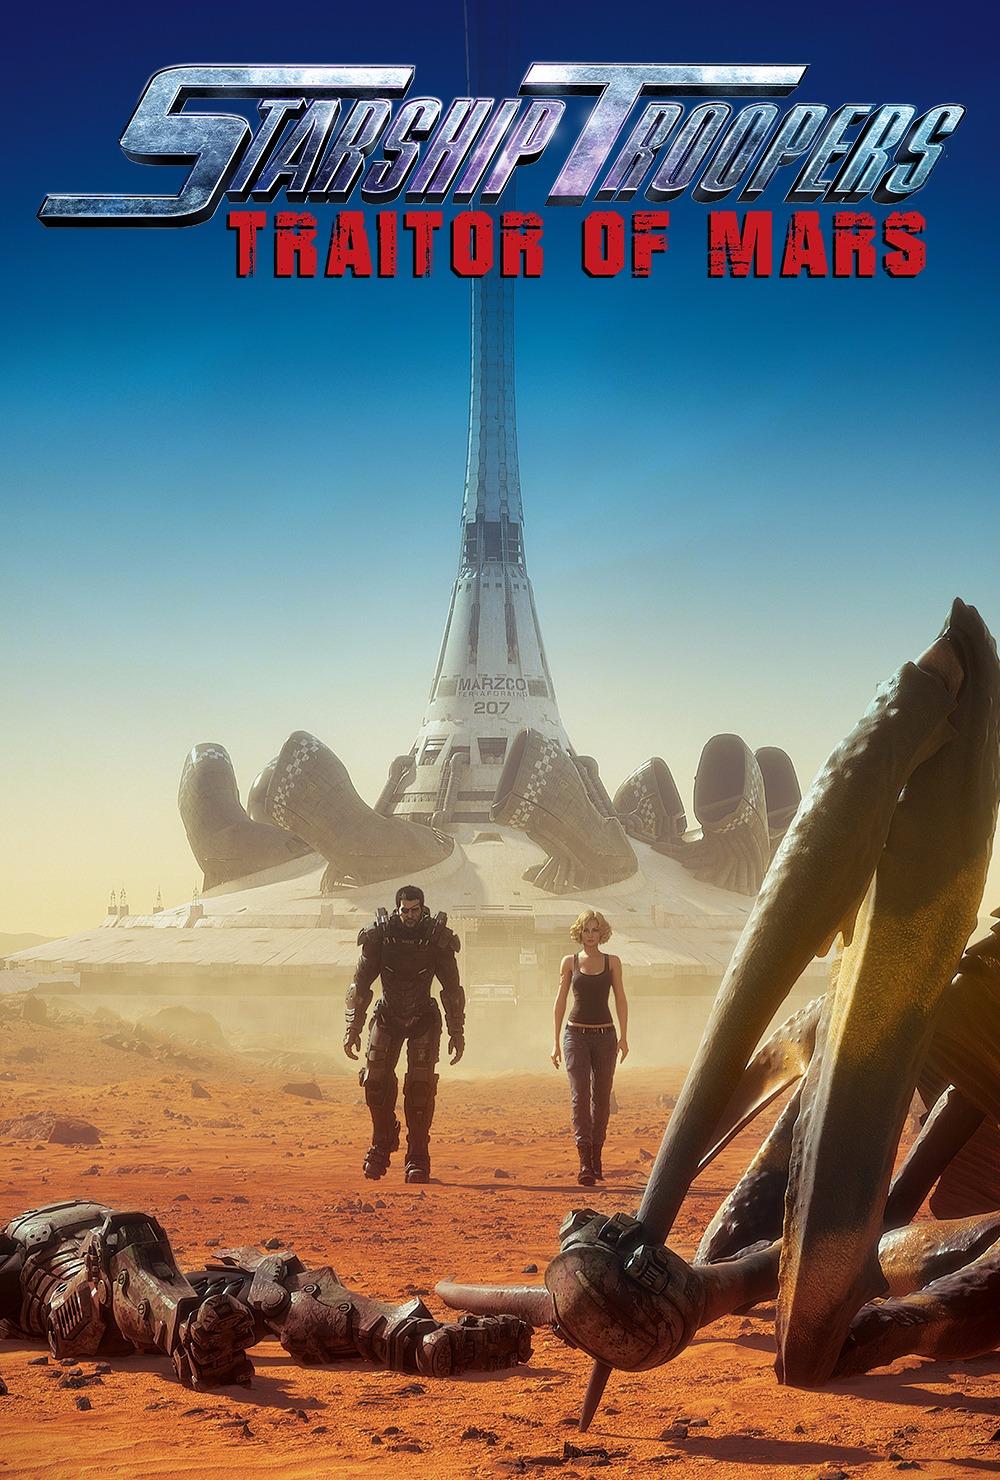 Starship Trooper - Traitor of mars